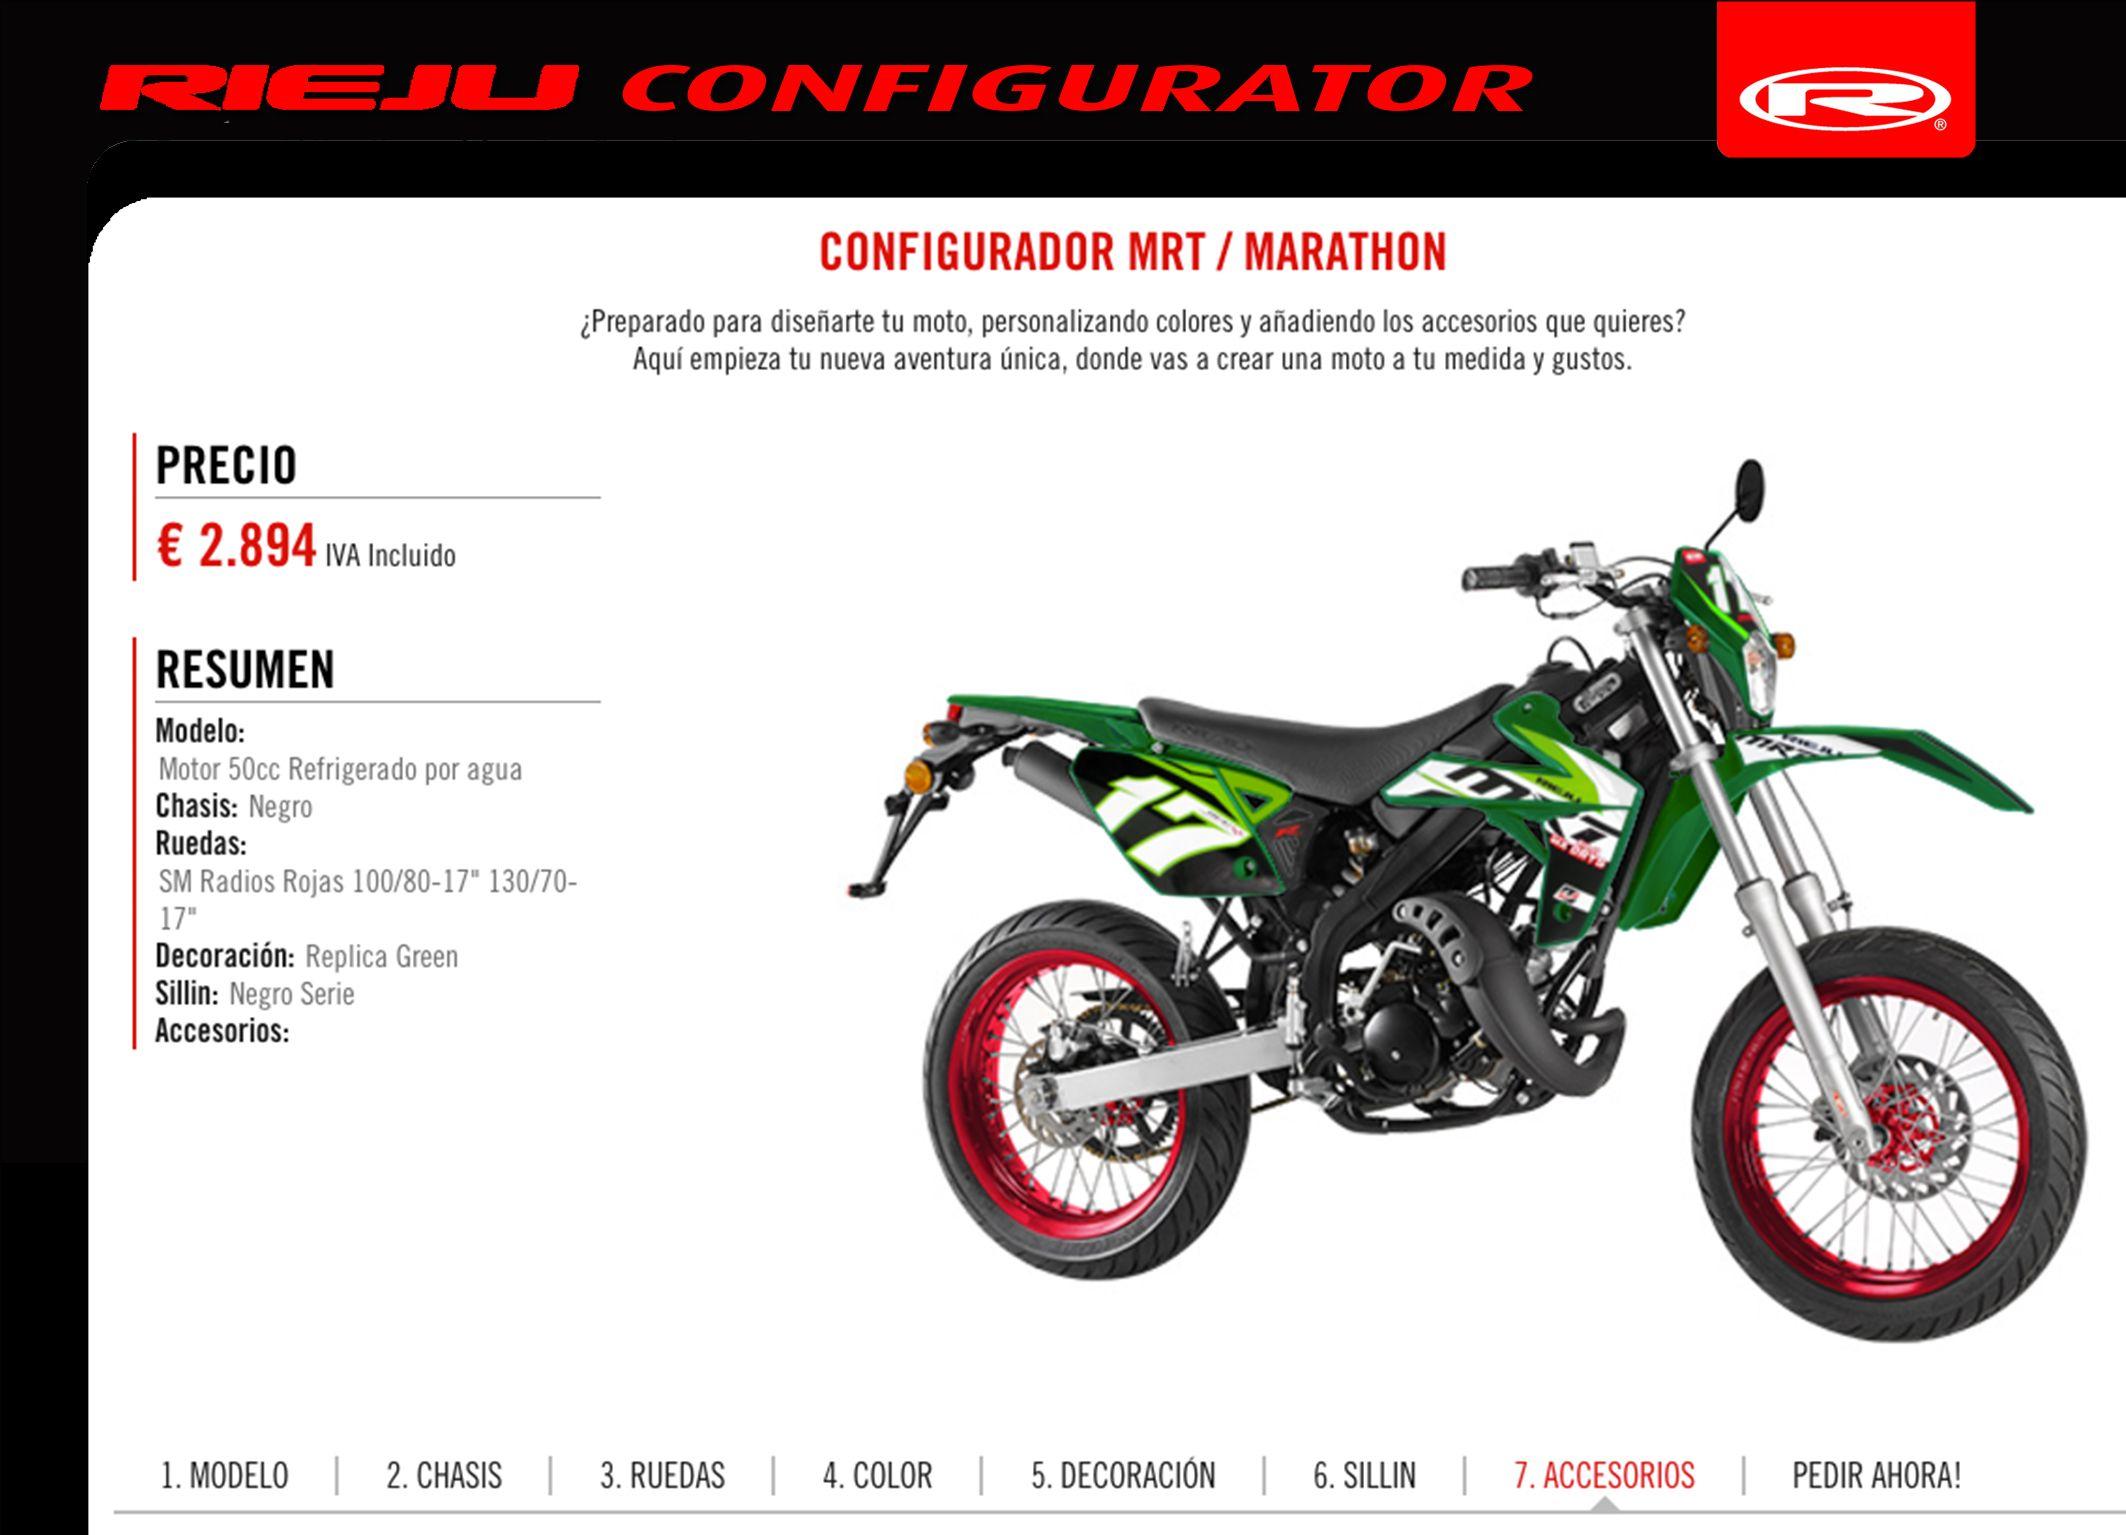 Disena Tu Moto A Medida Con El Configurador Rieju Il Dessine Ta Moto Sur Mesure Avec Le Configurateur Rieju Http Blog Rieju Es With Images Motorcycle